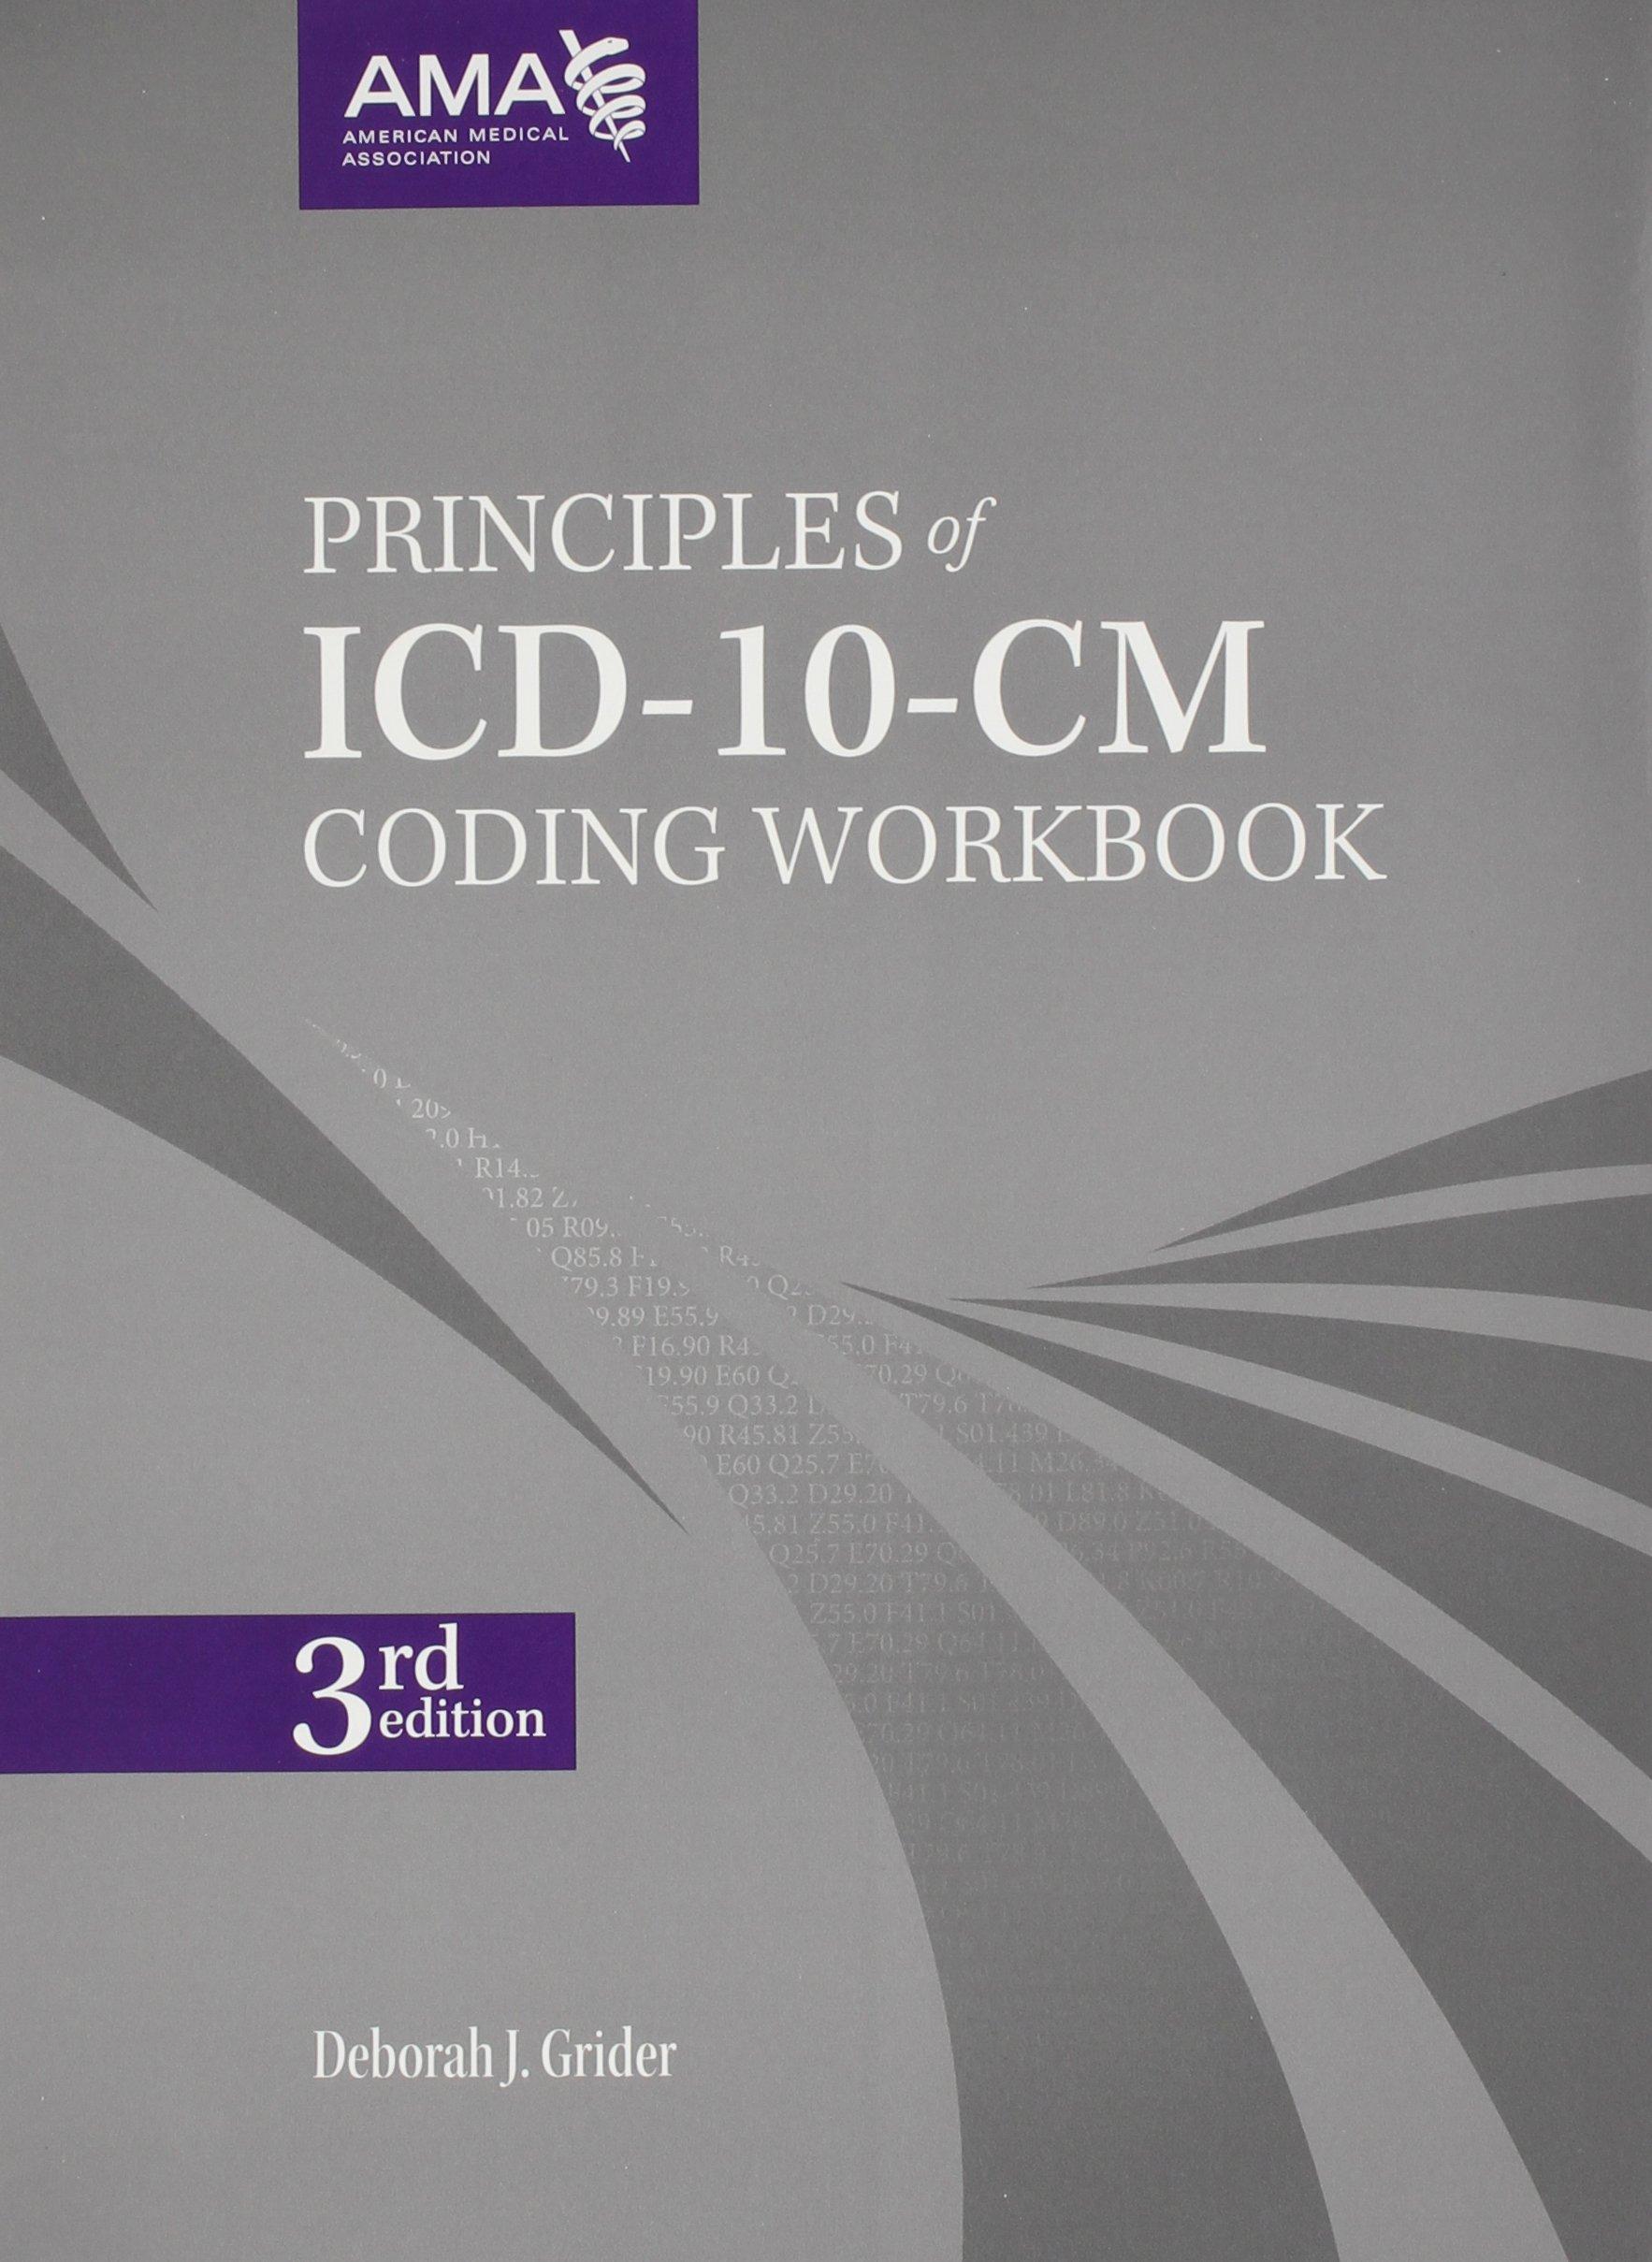 Principles of ICD-10-CM Coding